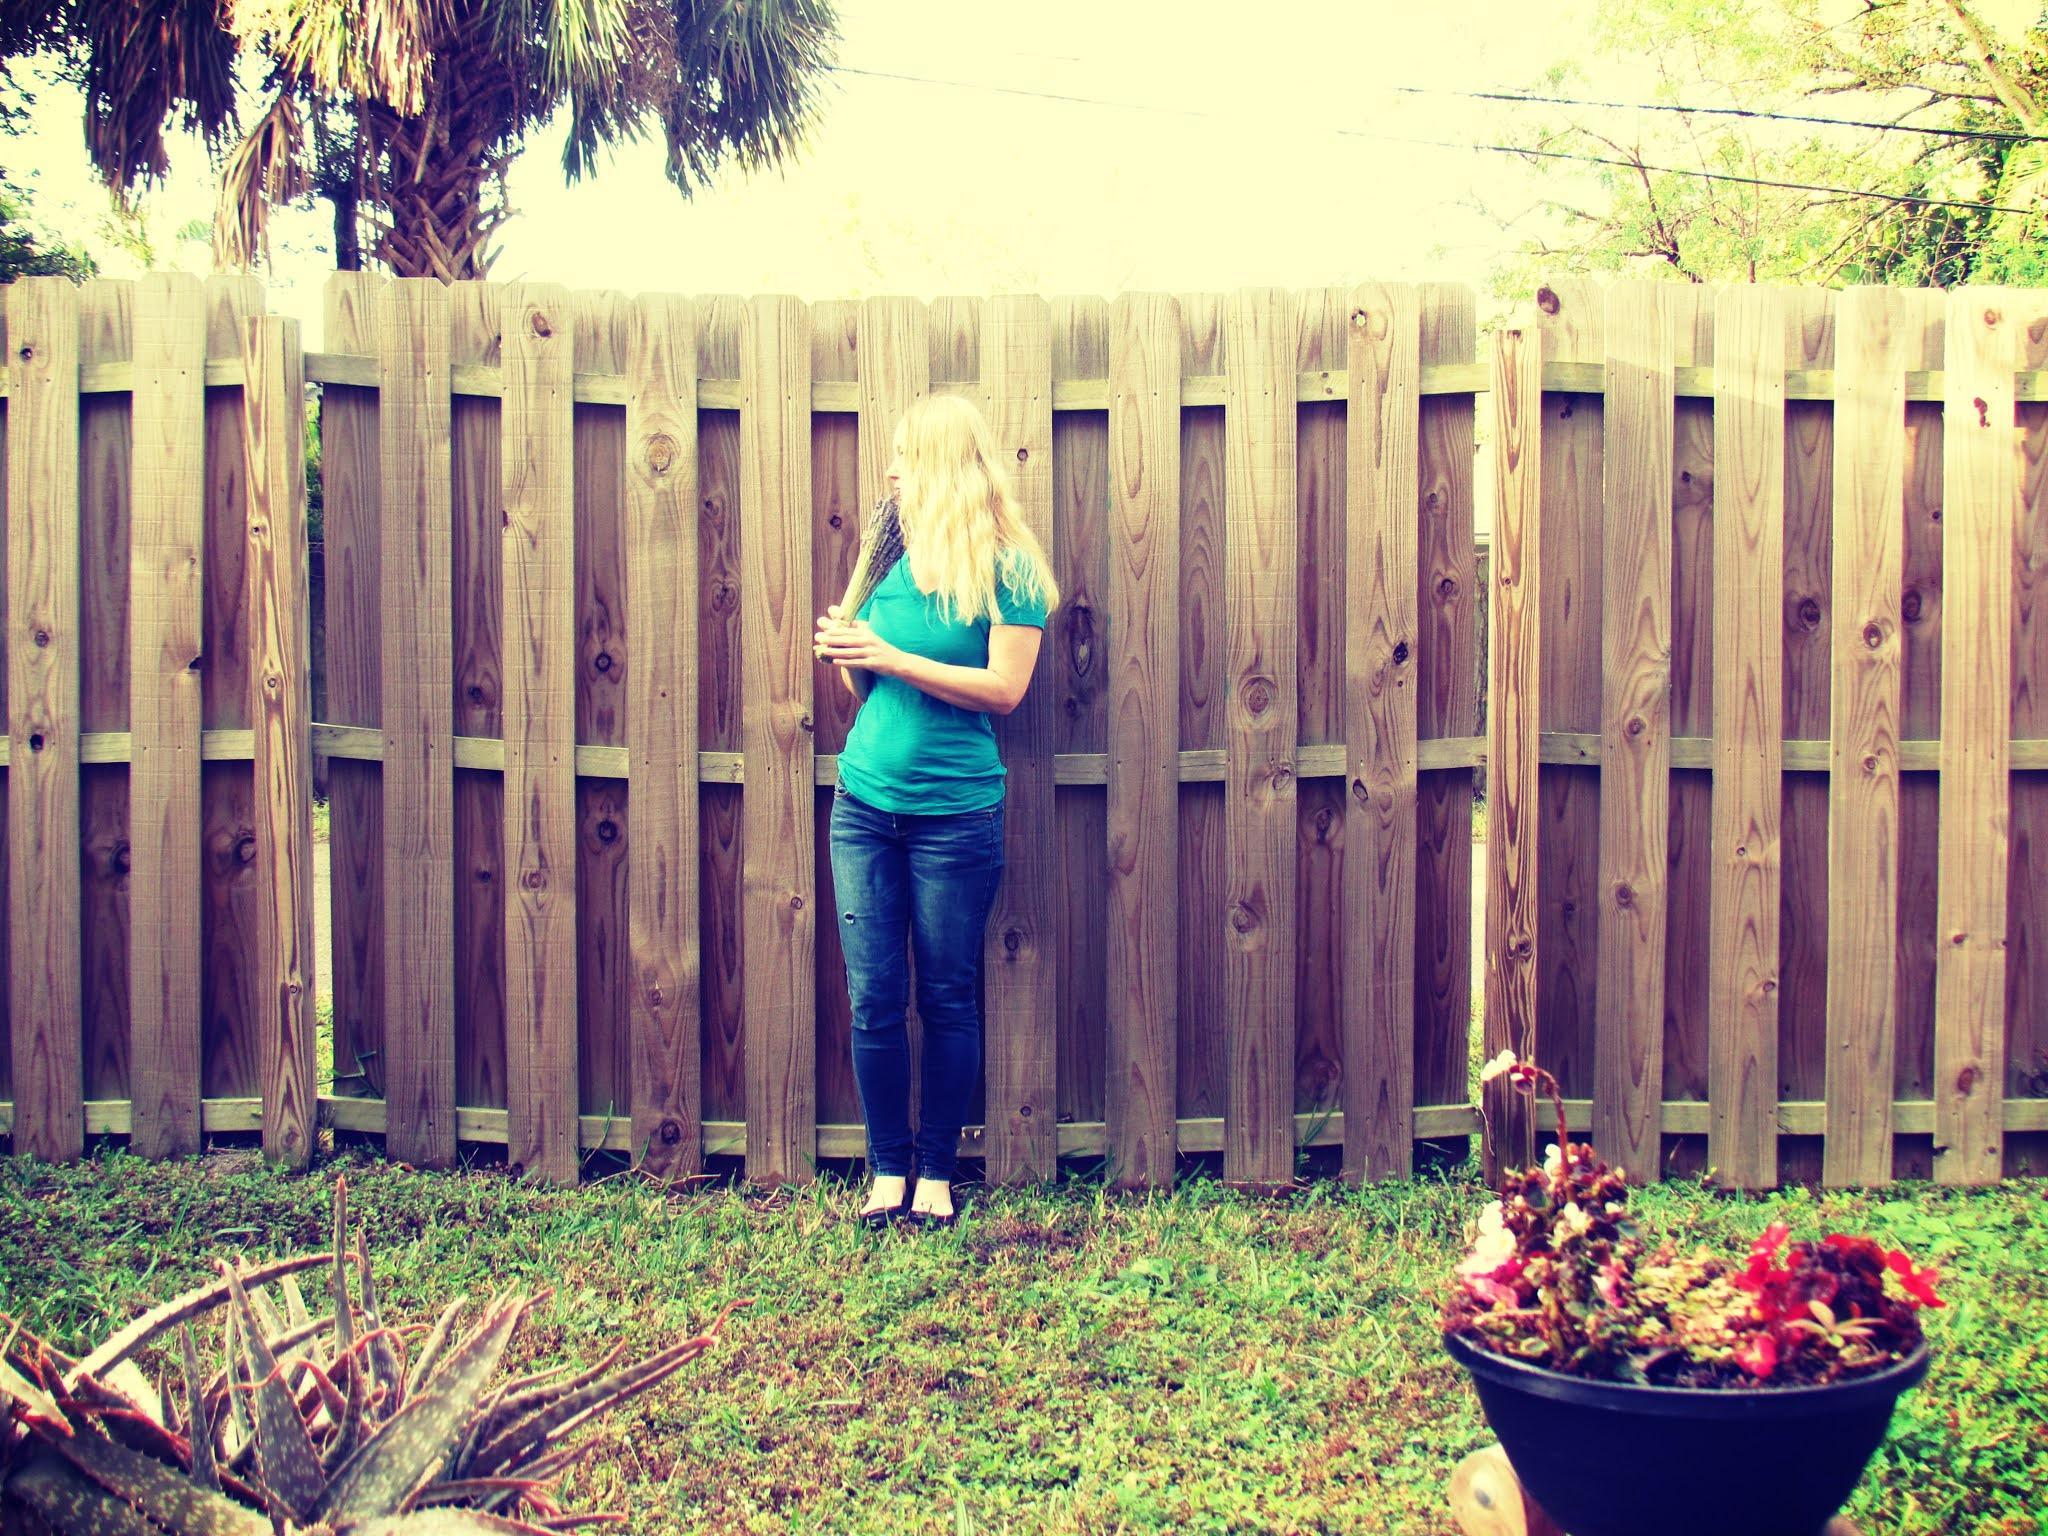 Green Backyard Oasis With Wooden Fence Ozona, Florida + Florida living, Small-town Florida